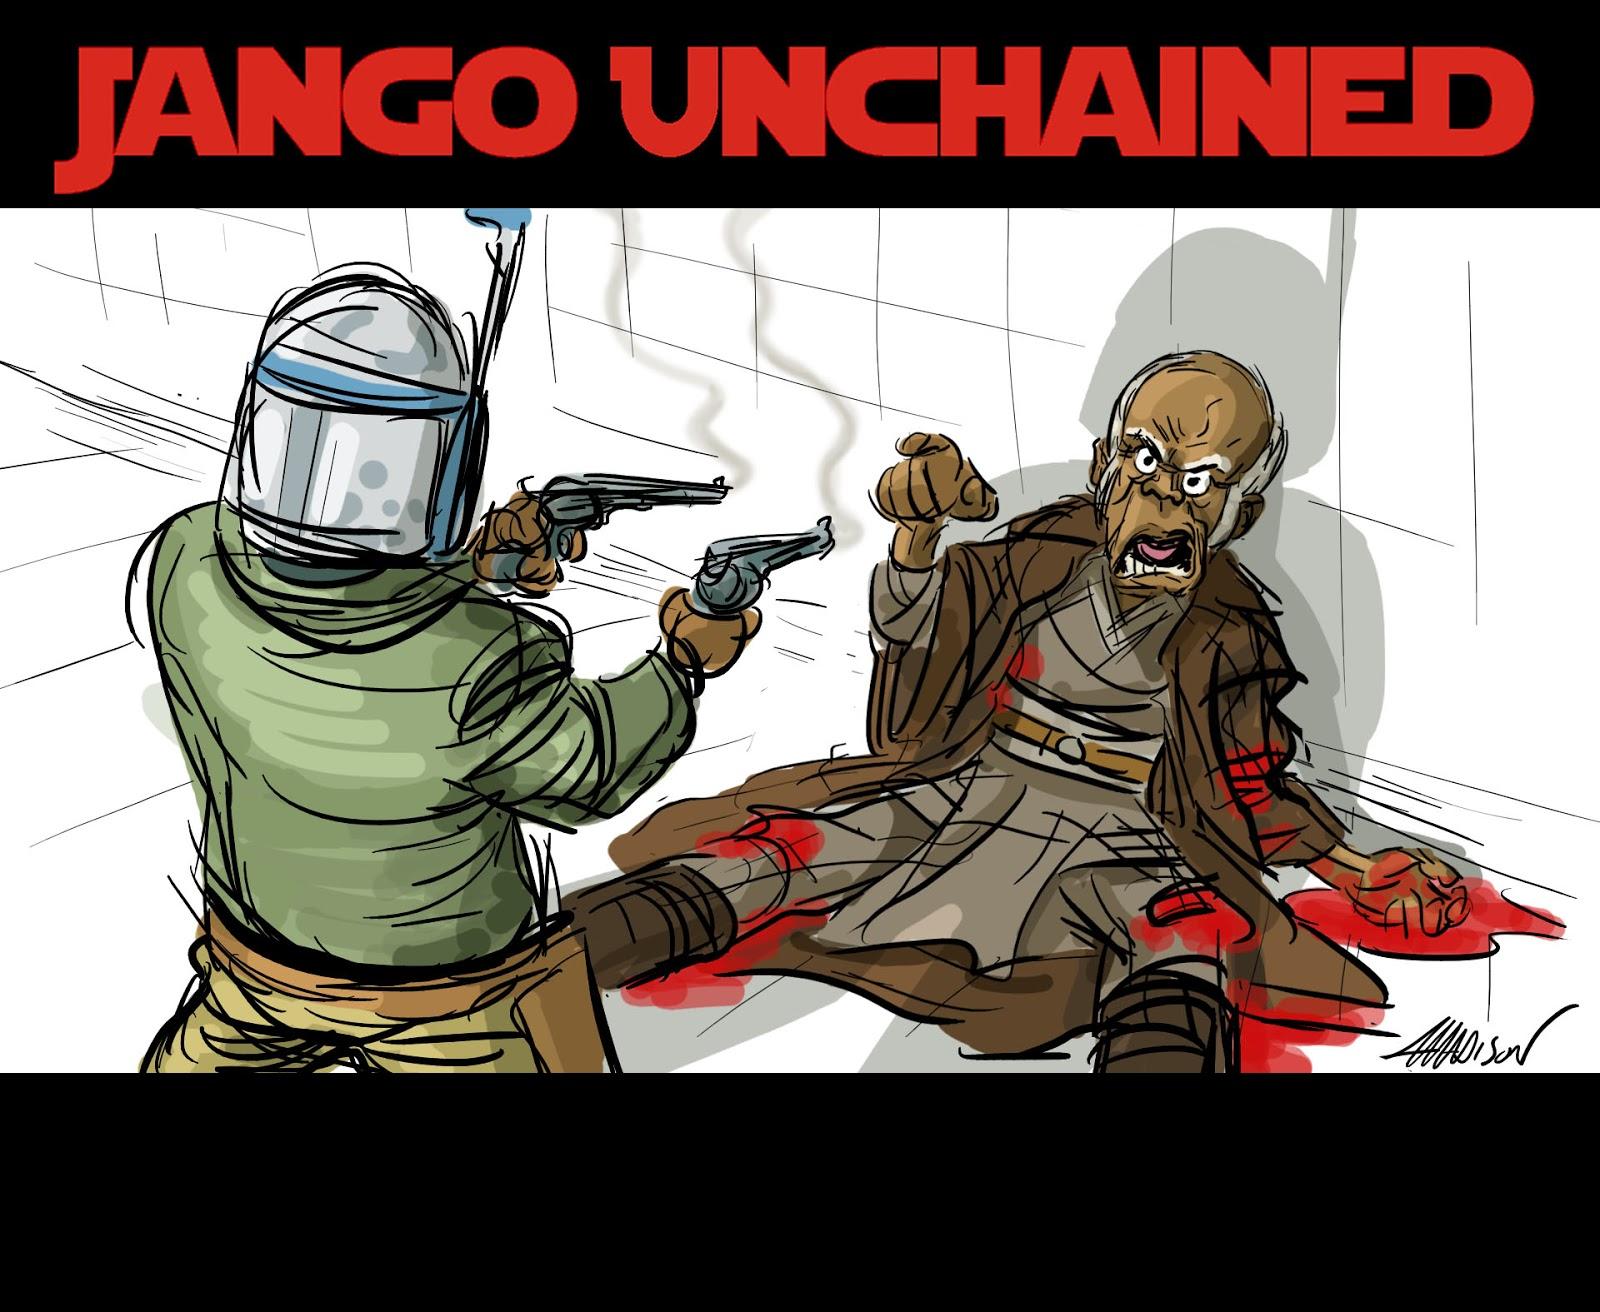 Popped Culture Jango Fett Unchained